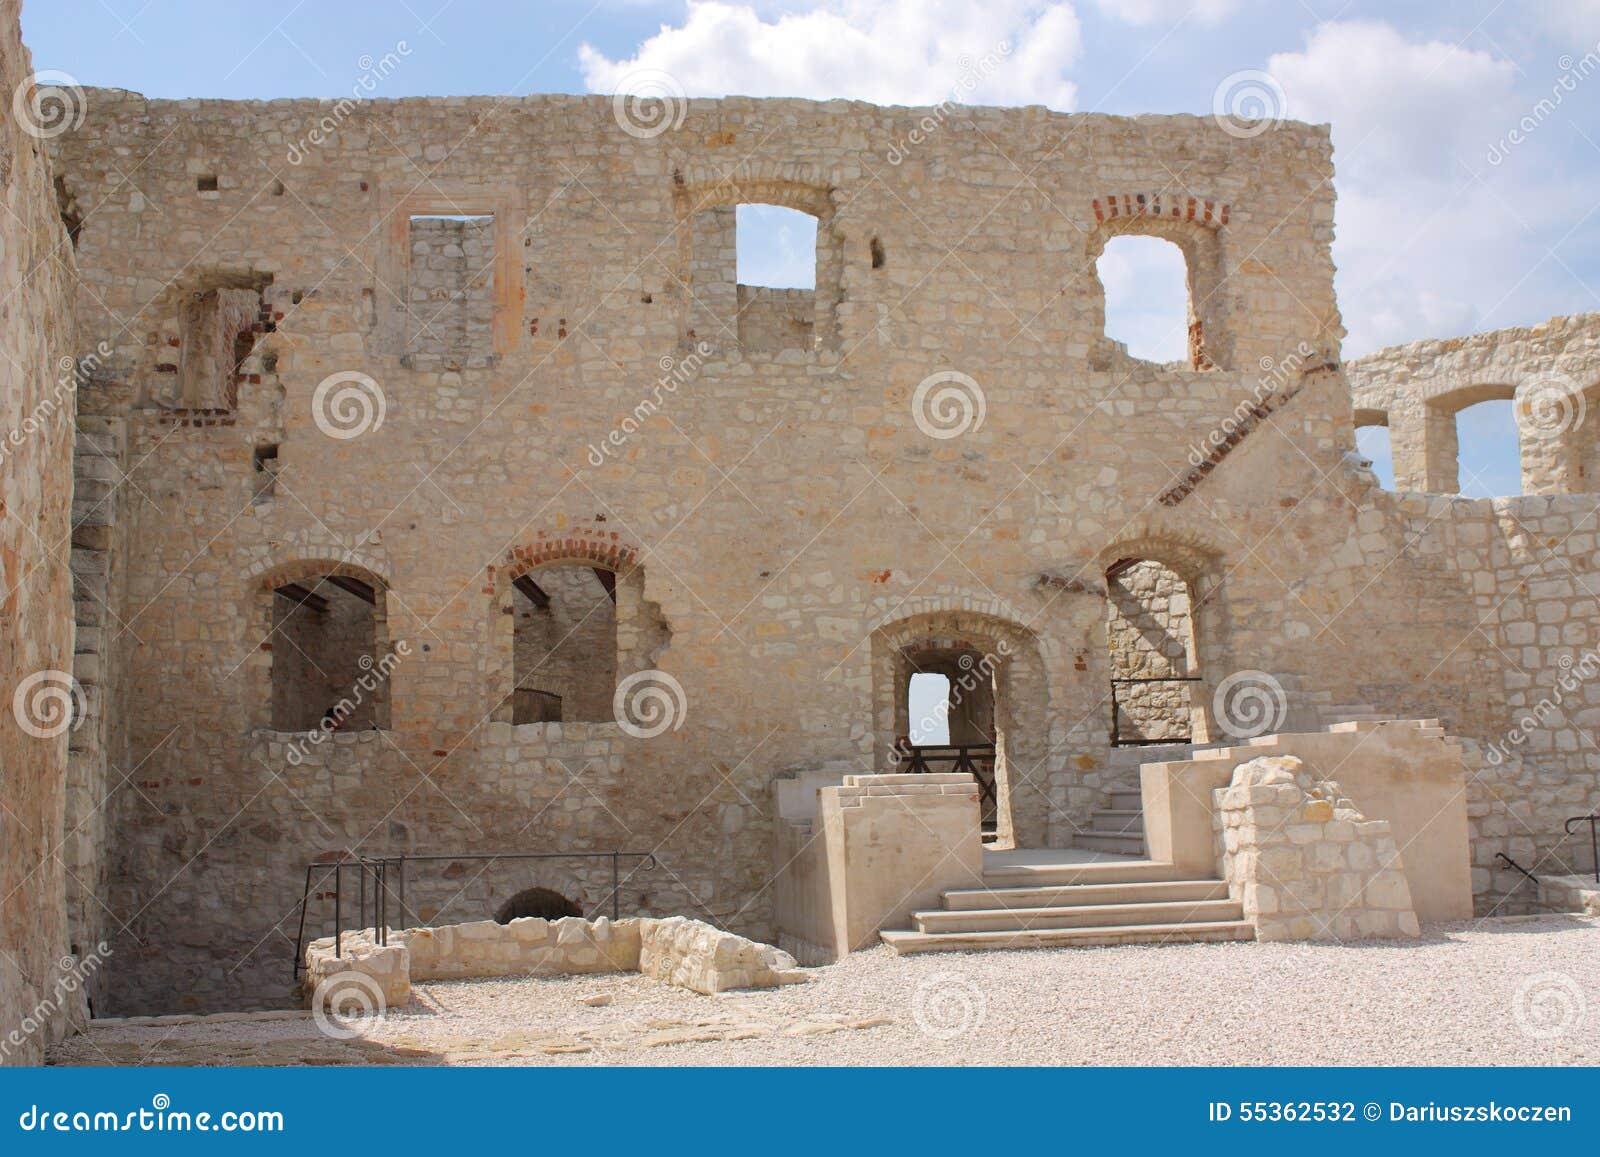 Kazimierz Dolny, le rovine del castello